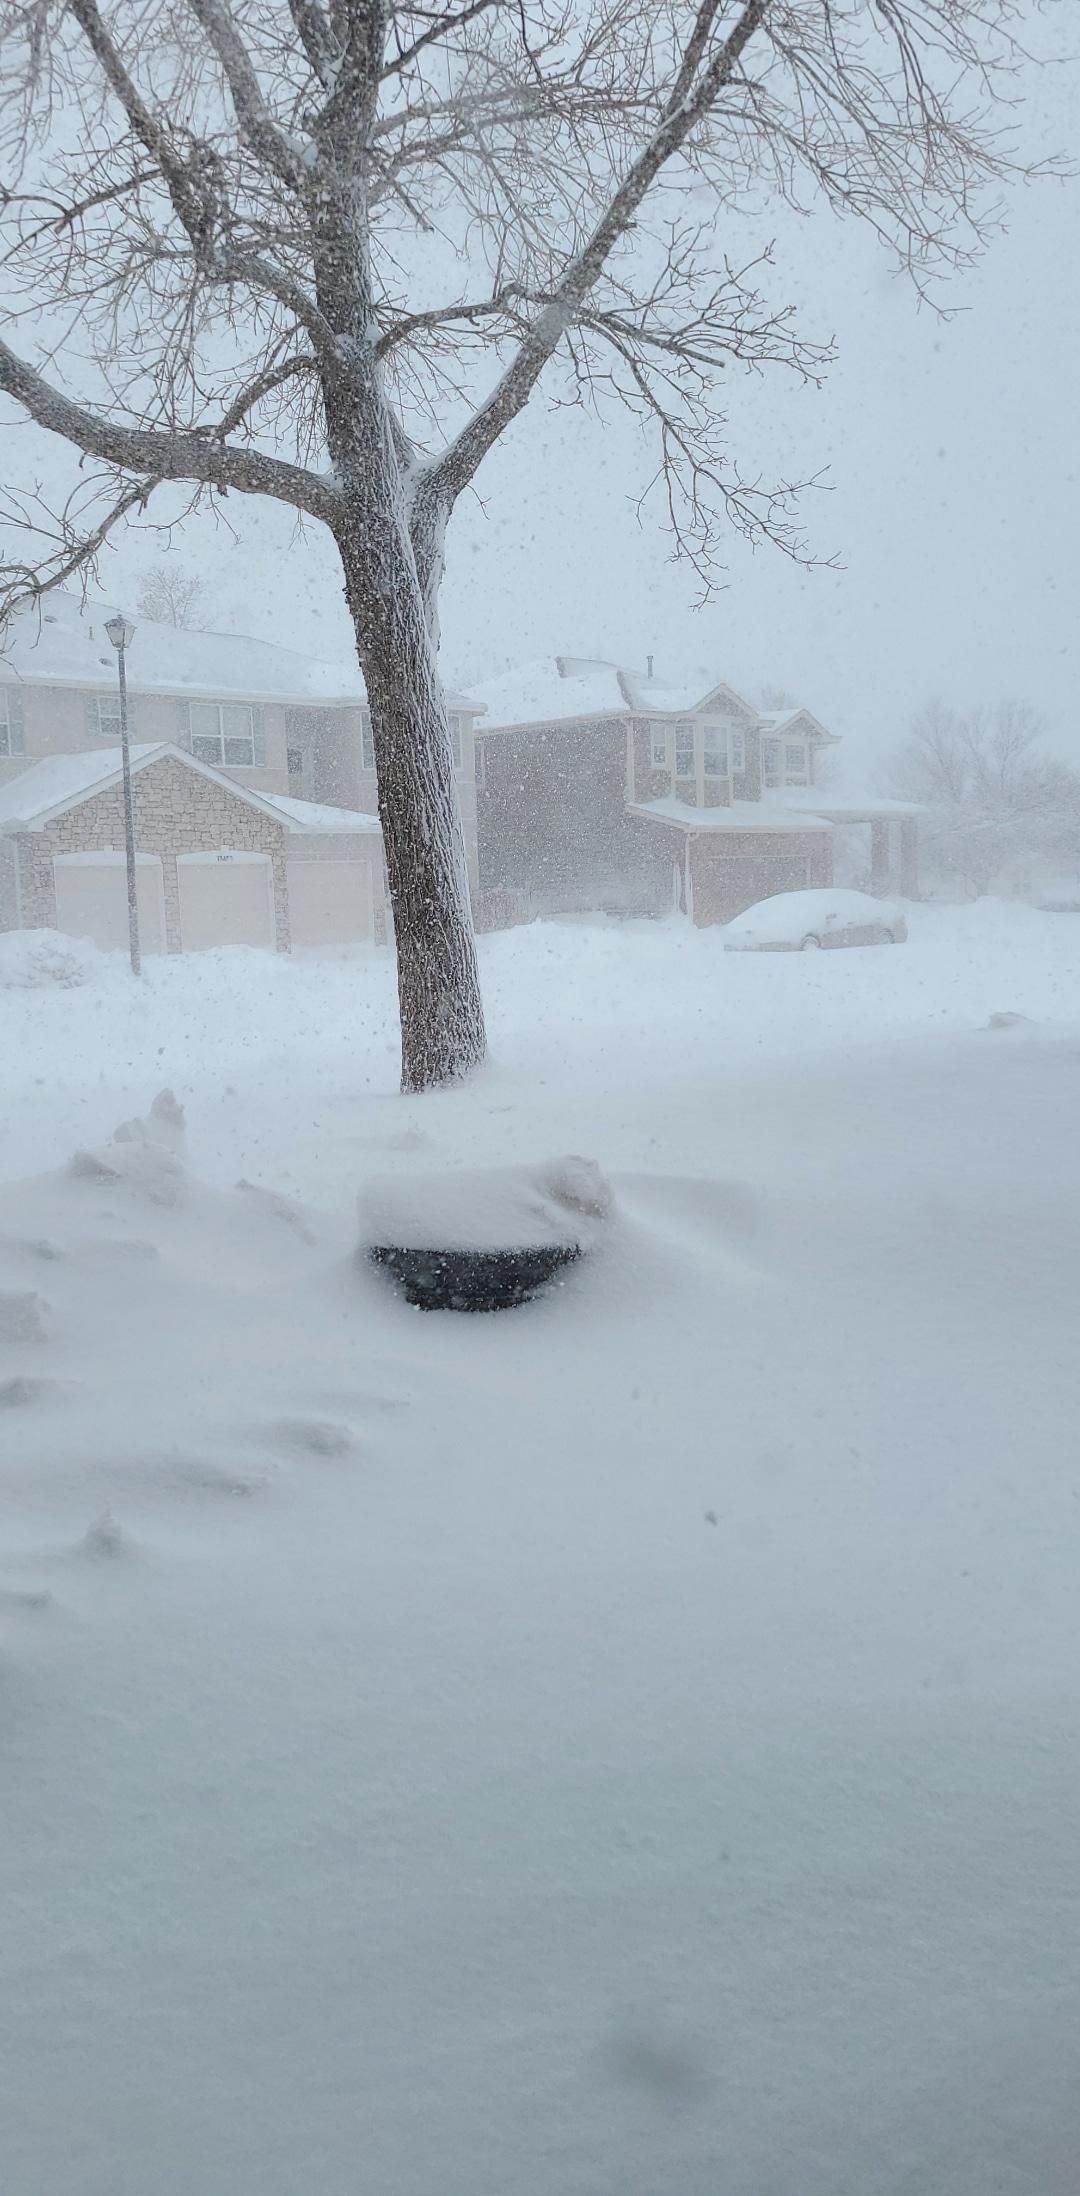 denver-snow-storm03-14-21.jpg